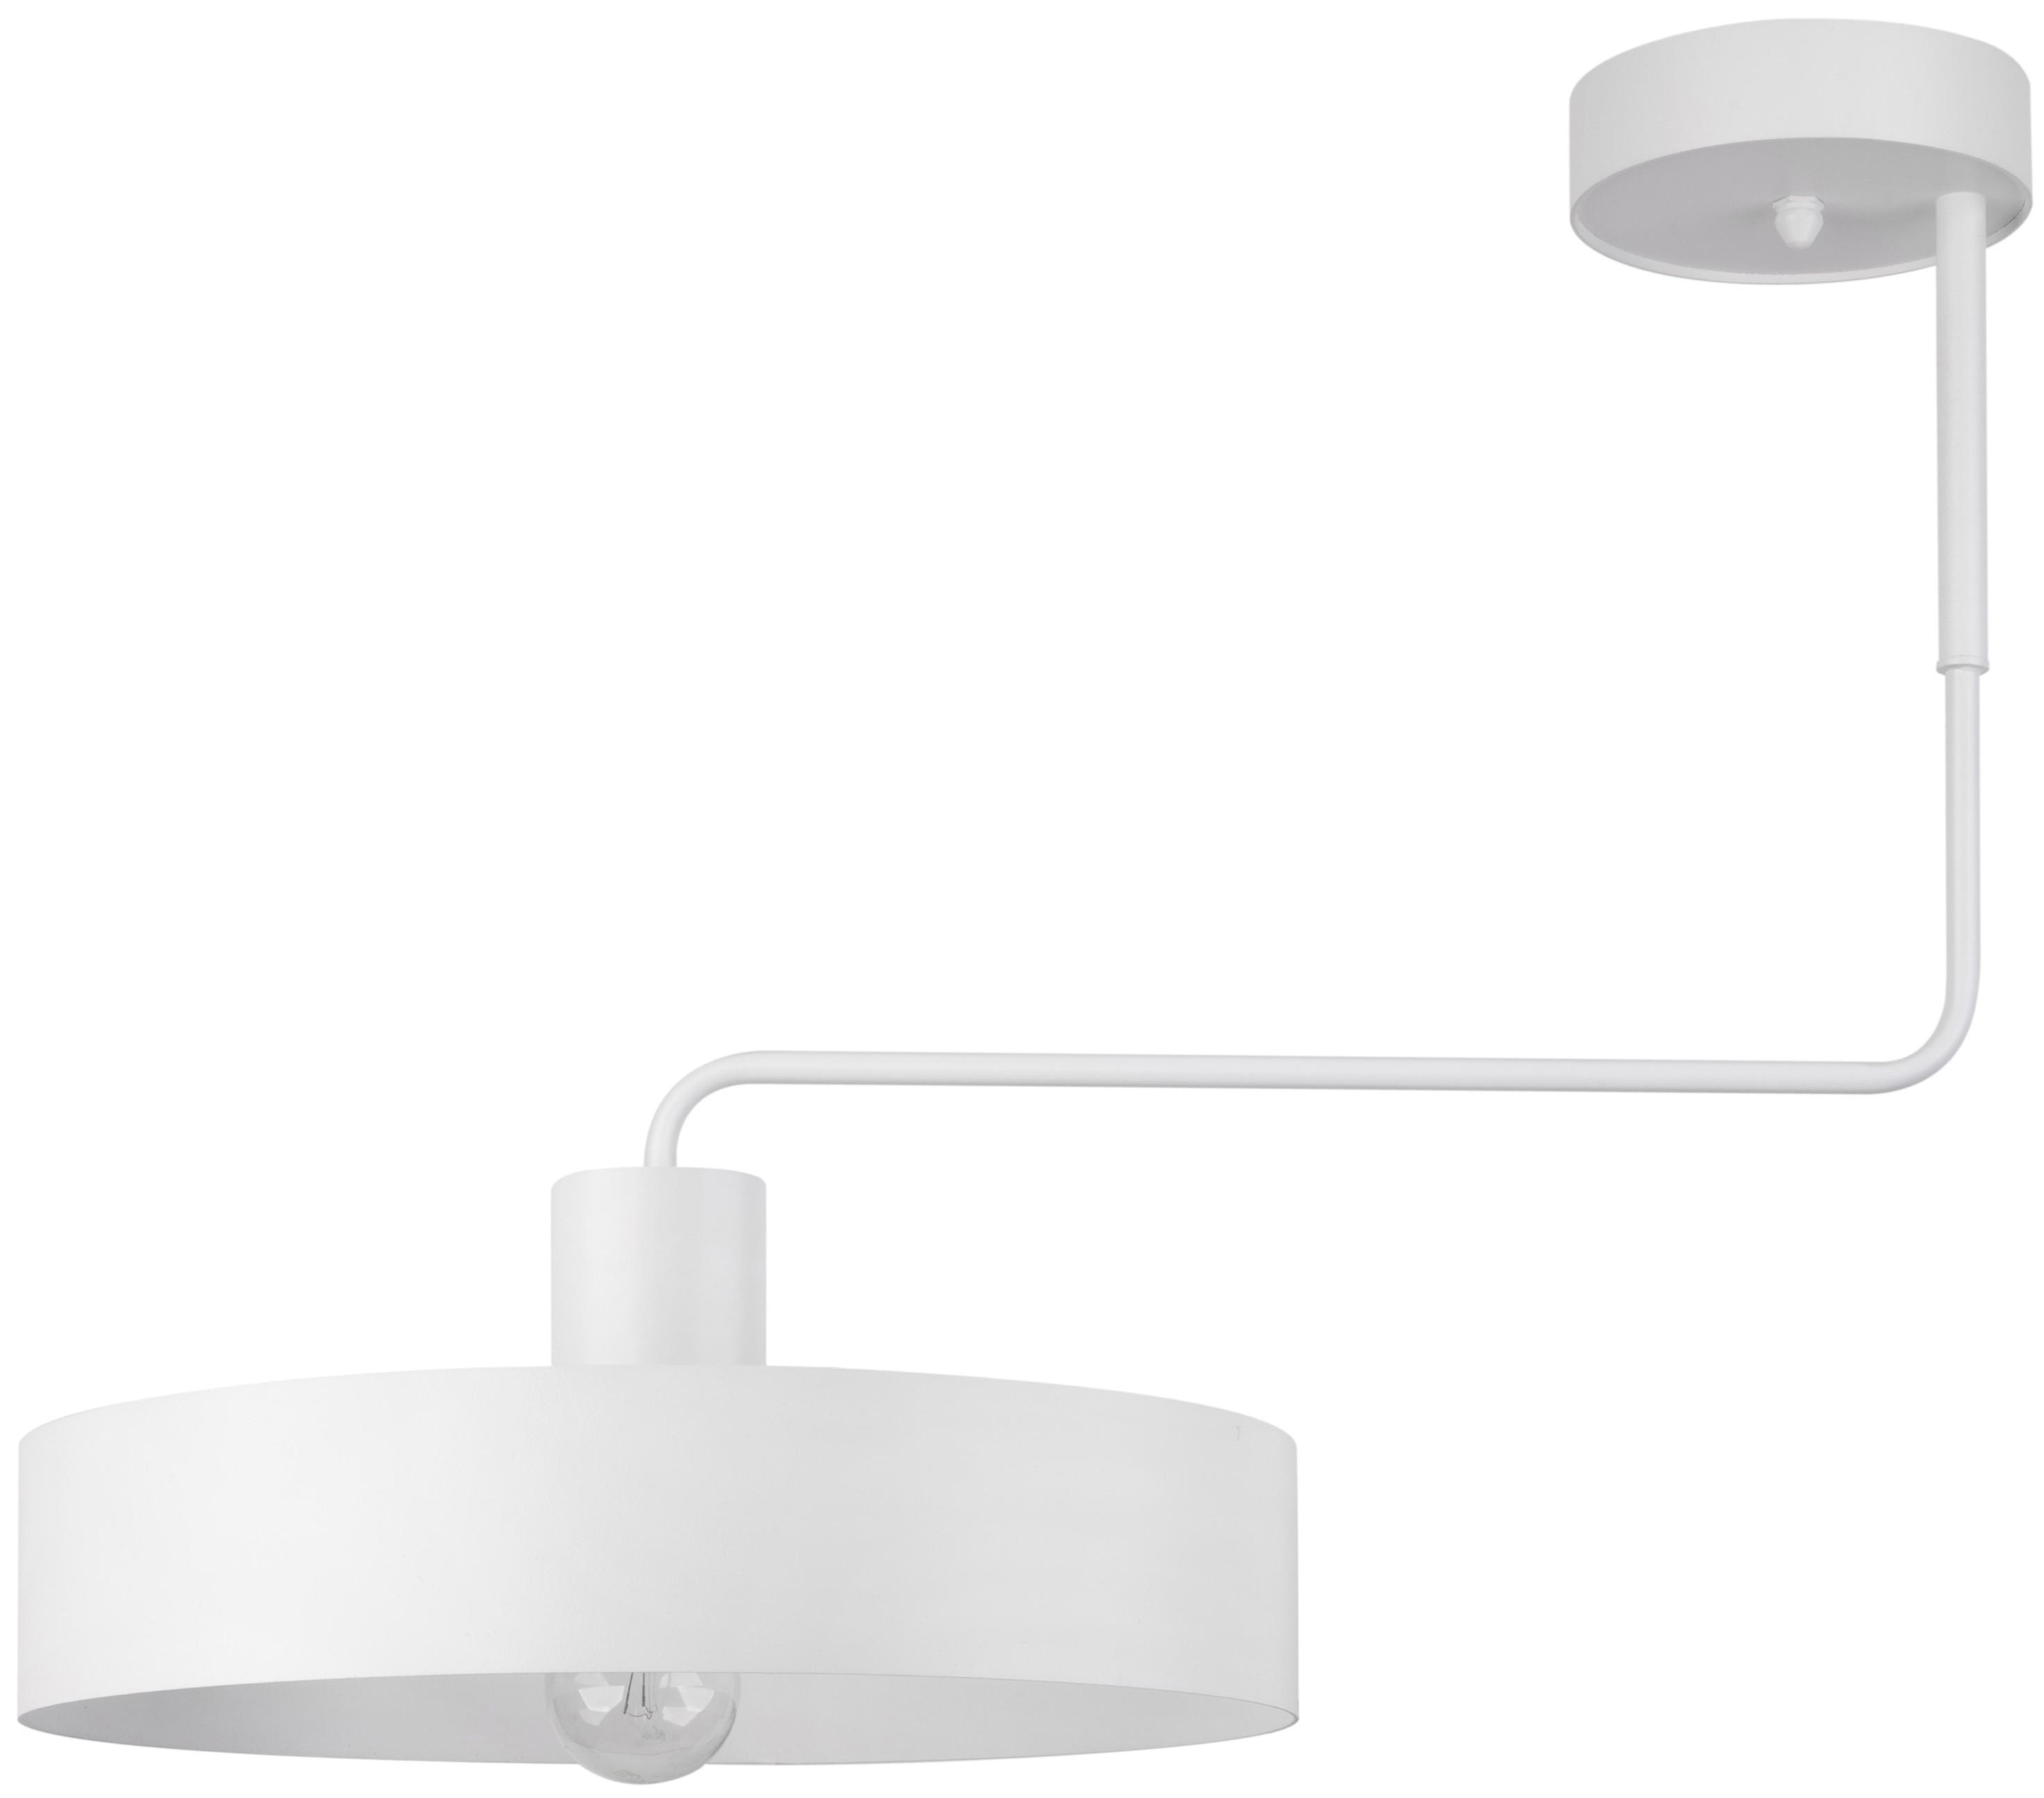 Lampe Deckenlampe Kronleuchter Modern Design Vasco Weiss 1 Flg 31550